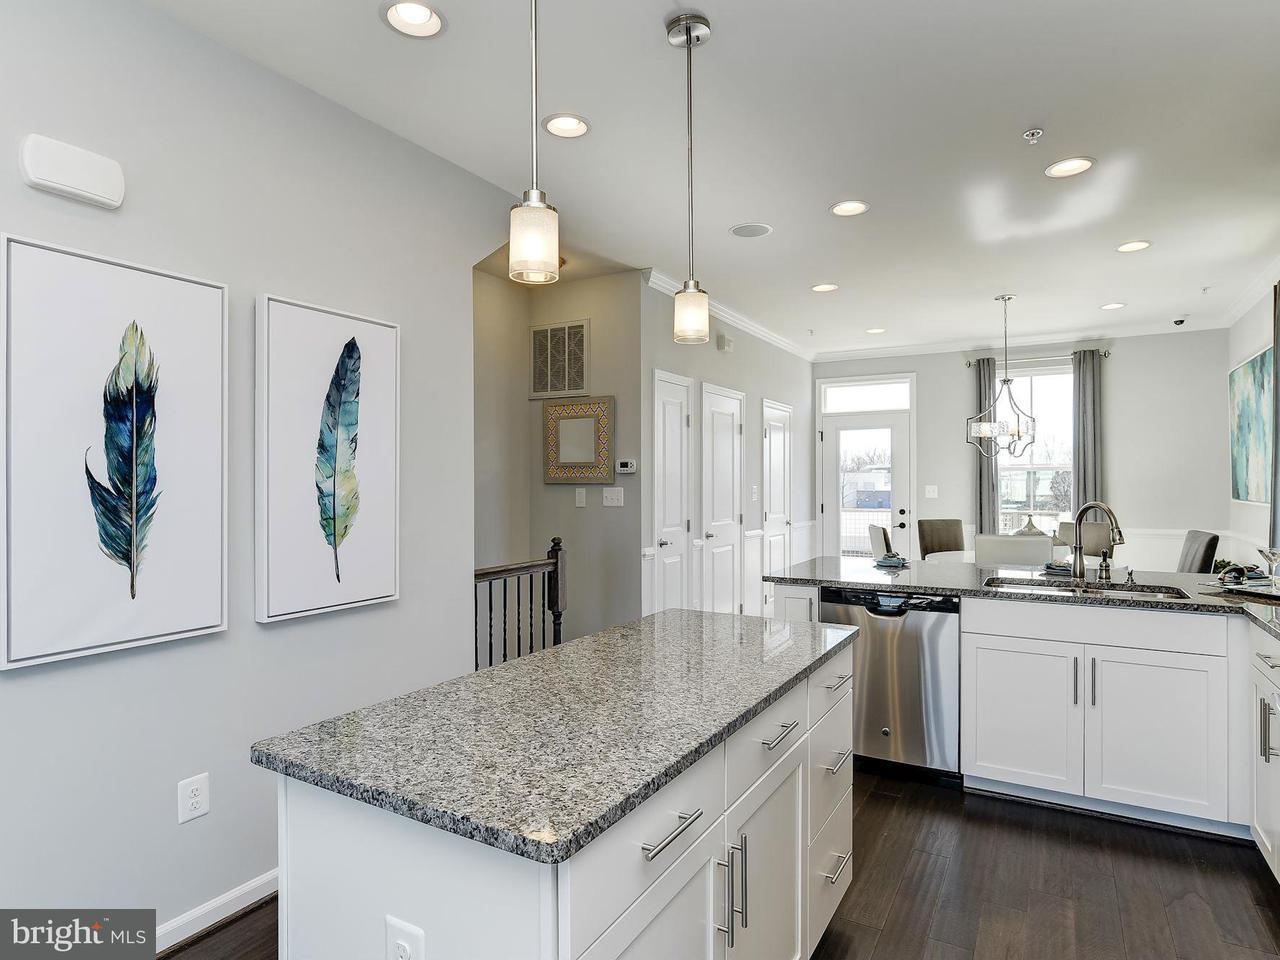 Additional photo for property listing at 3635 JAMISON ST NE 3635 JAMISON ST NE Washington, Distrito De Columbia 20018 Estados Unidos